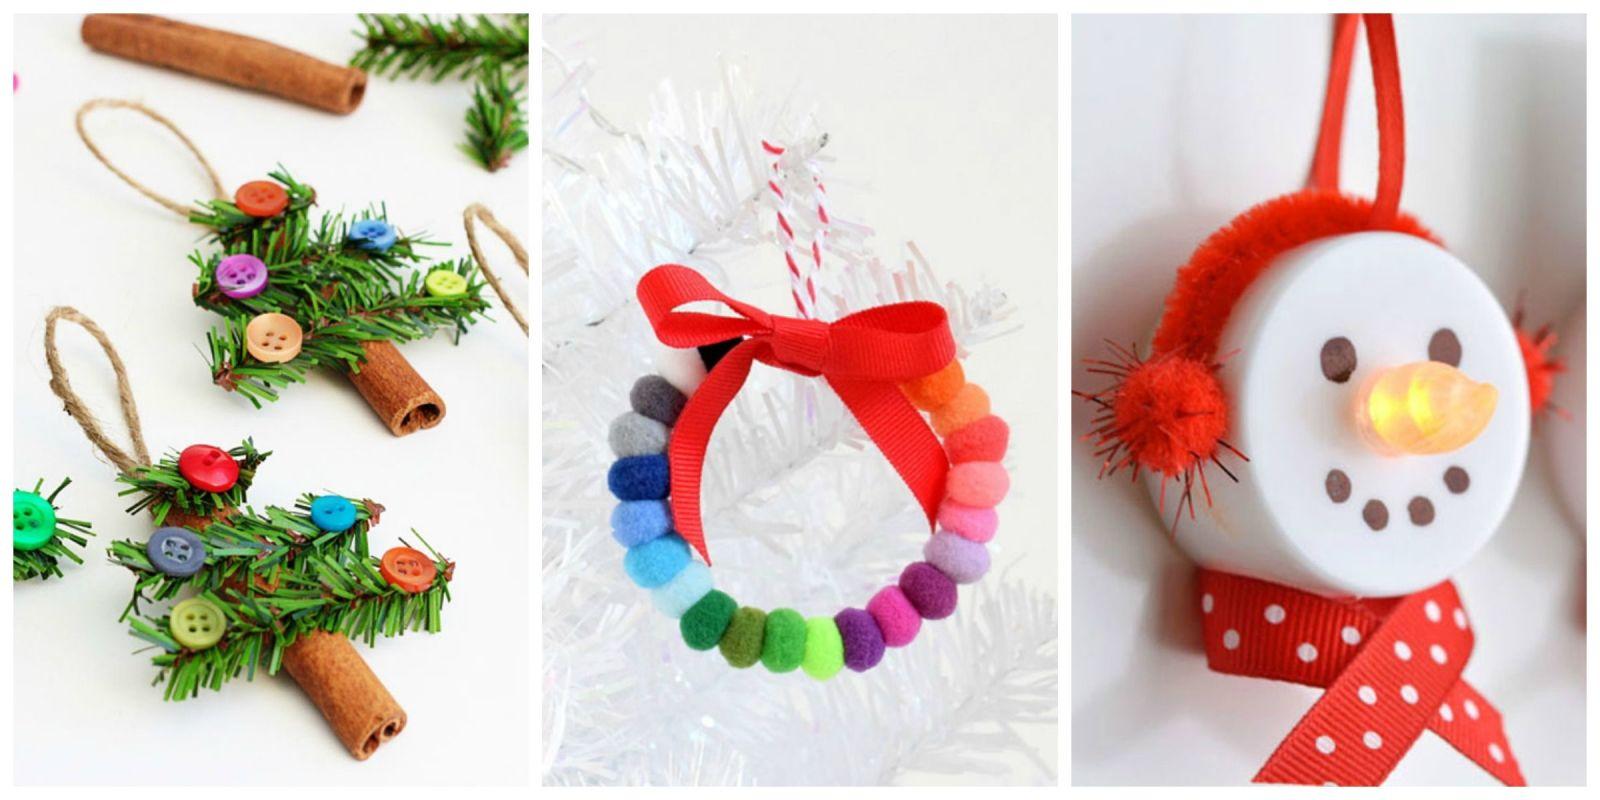 Career christmas ornaments - Career Christmas Ornaments 55